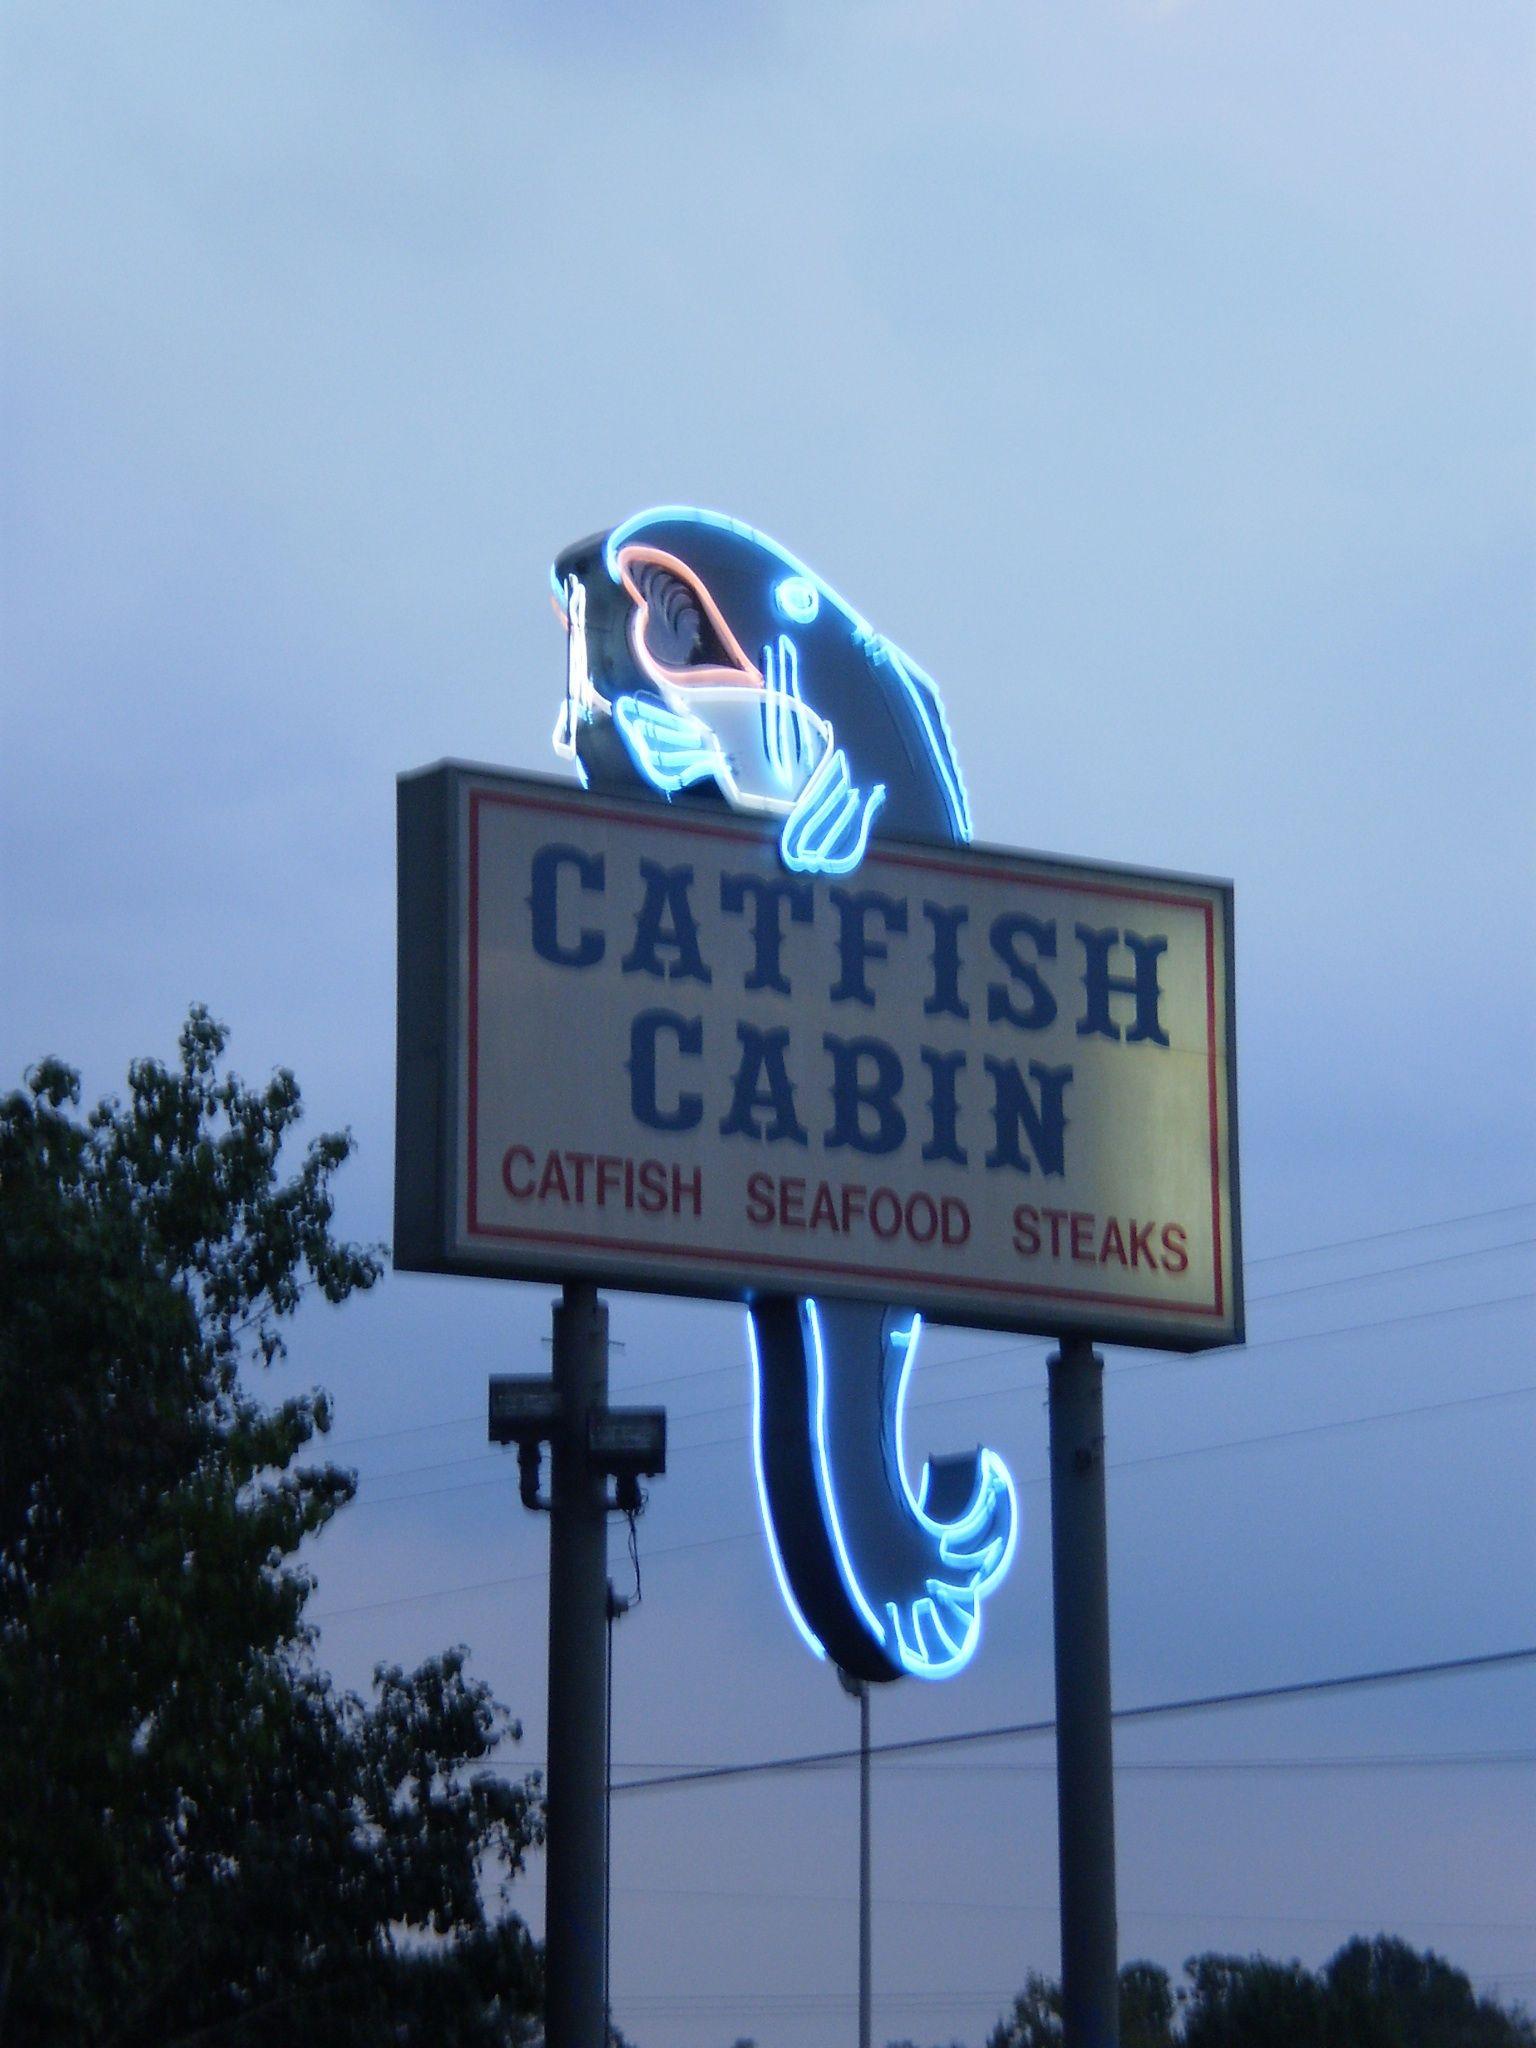 Catfish Cabin Jackson Tn Best Catfish Ever We Always Eat There